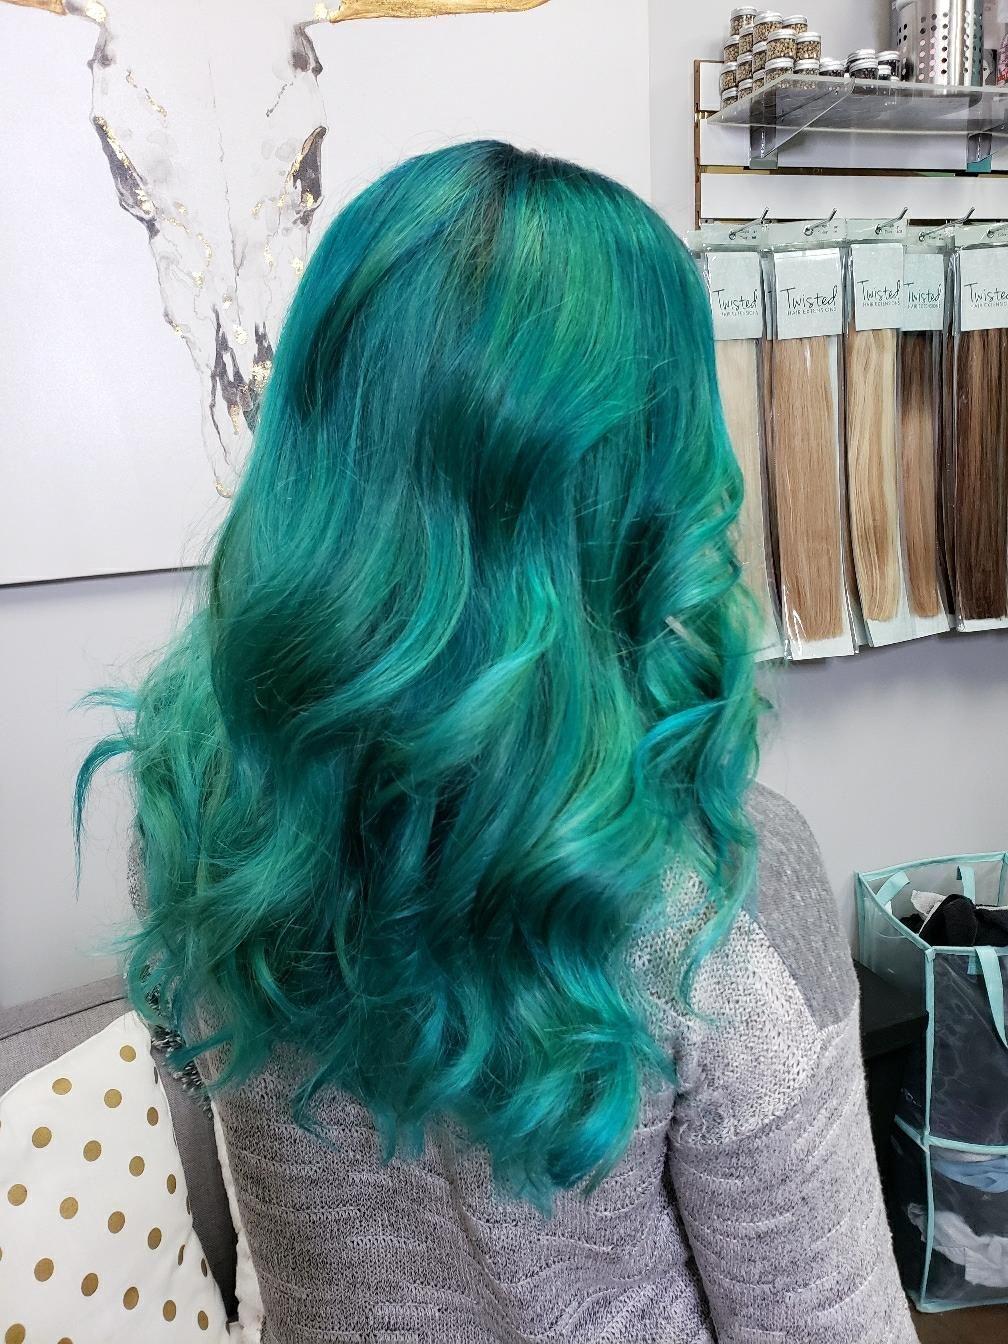 Pin on Green Hair Ideas & Styles